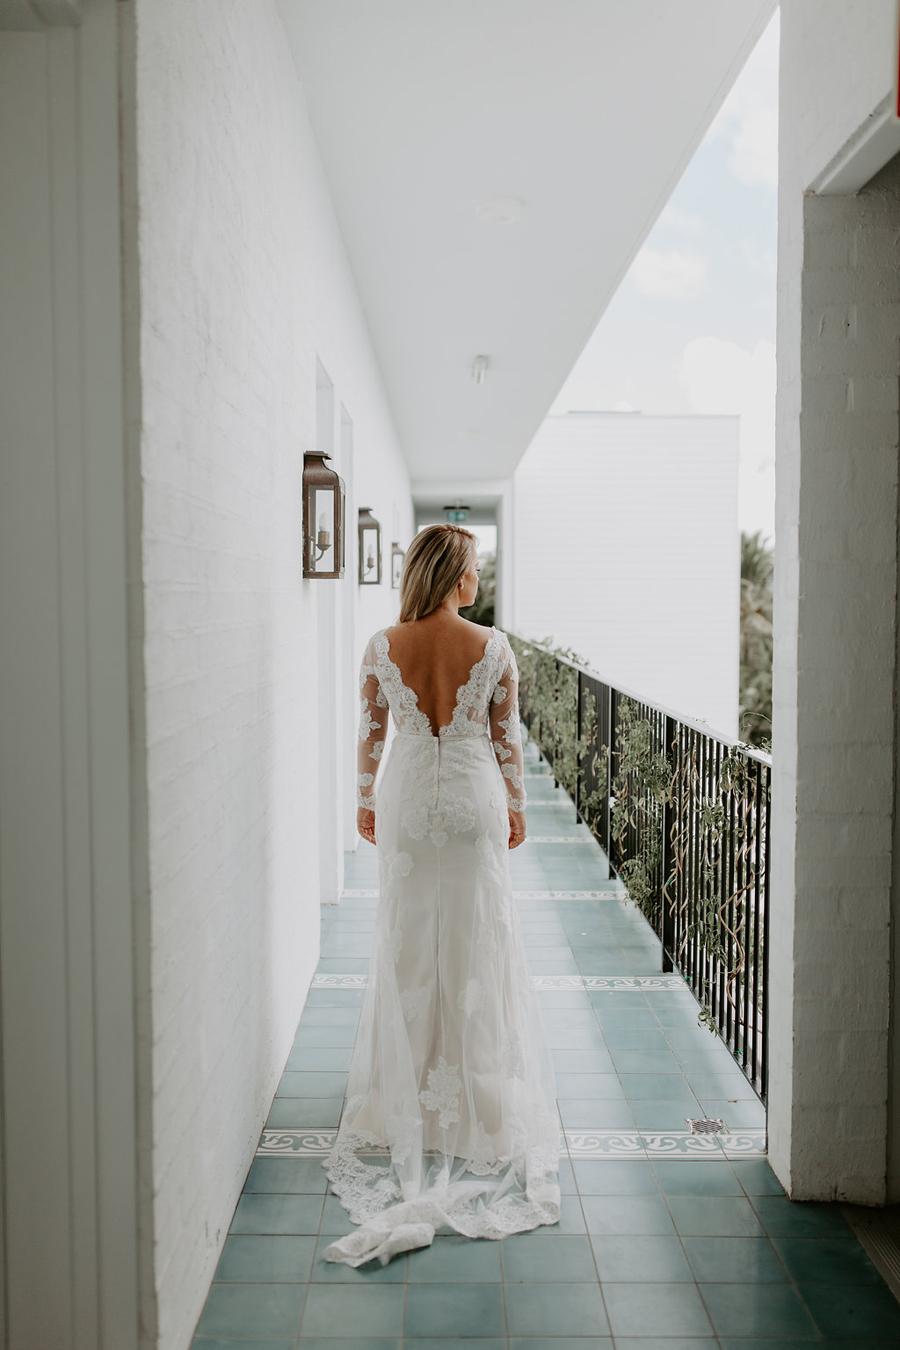 Bride at Cabarita wedding accommodation